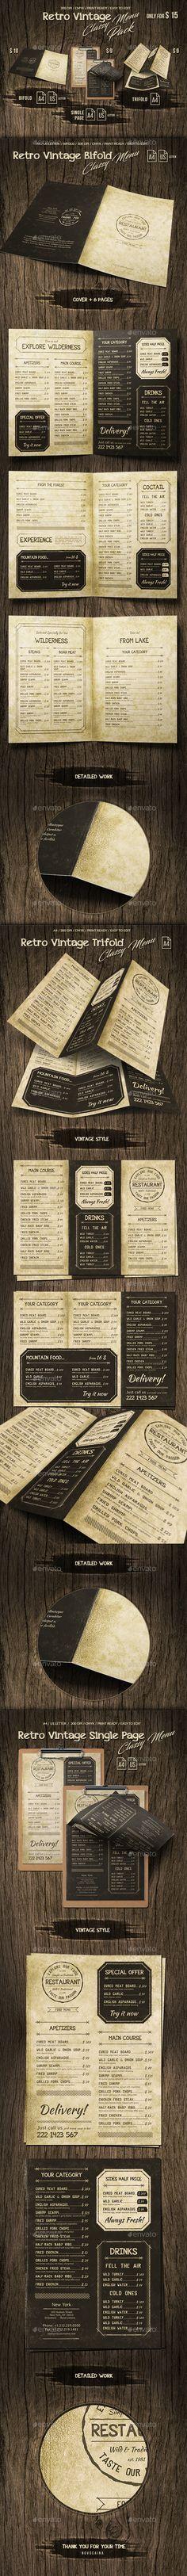 Hotel Restaurant Menu Card 6